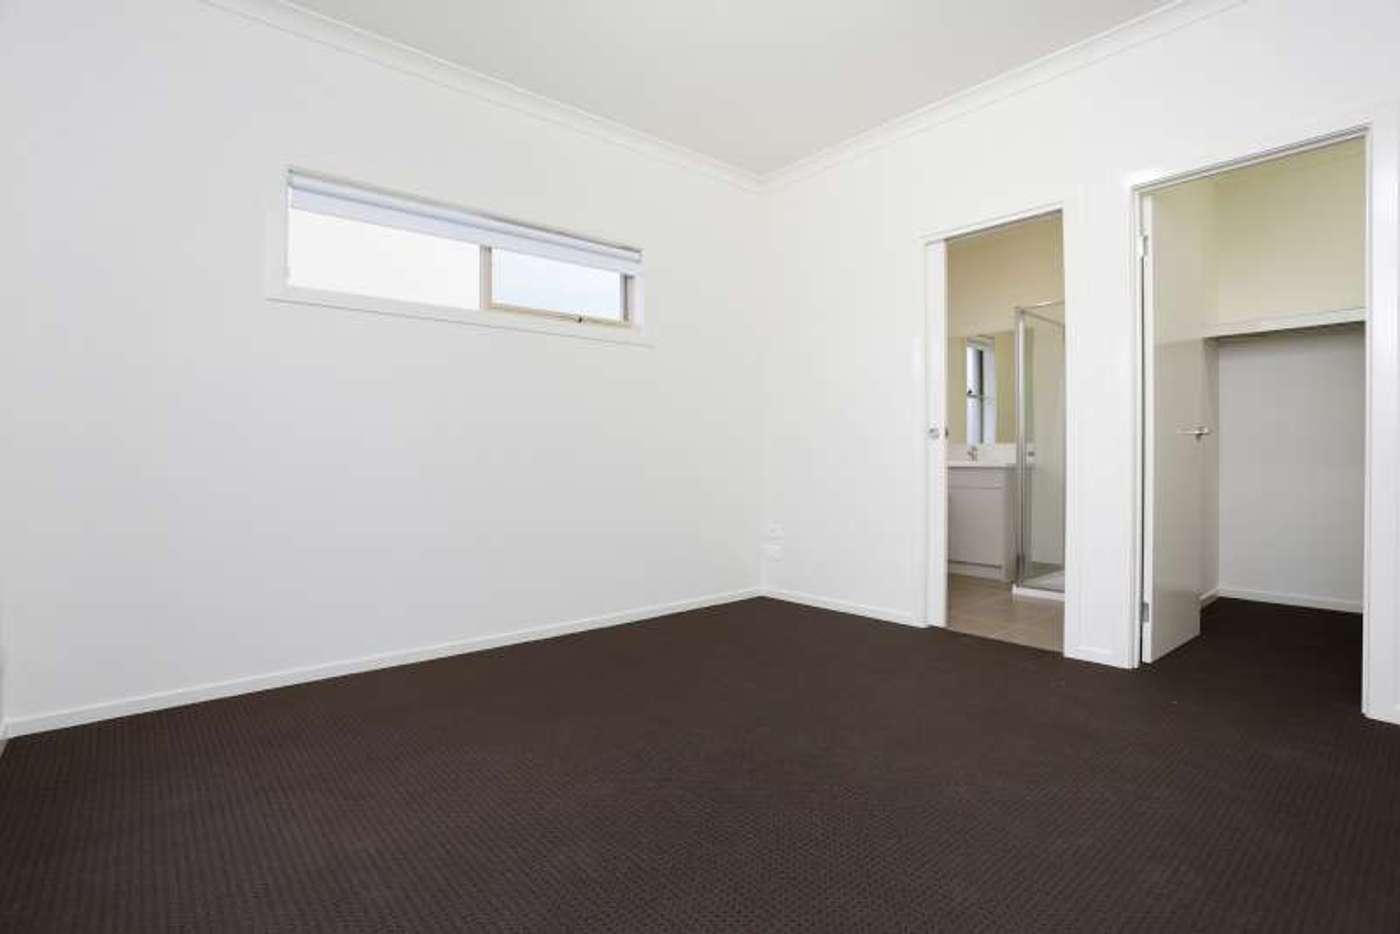 Fifth view of Homely house listing, 25 Ashford Drive, Pakenham VIC 3810